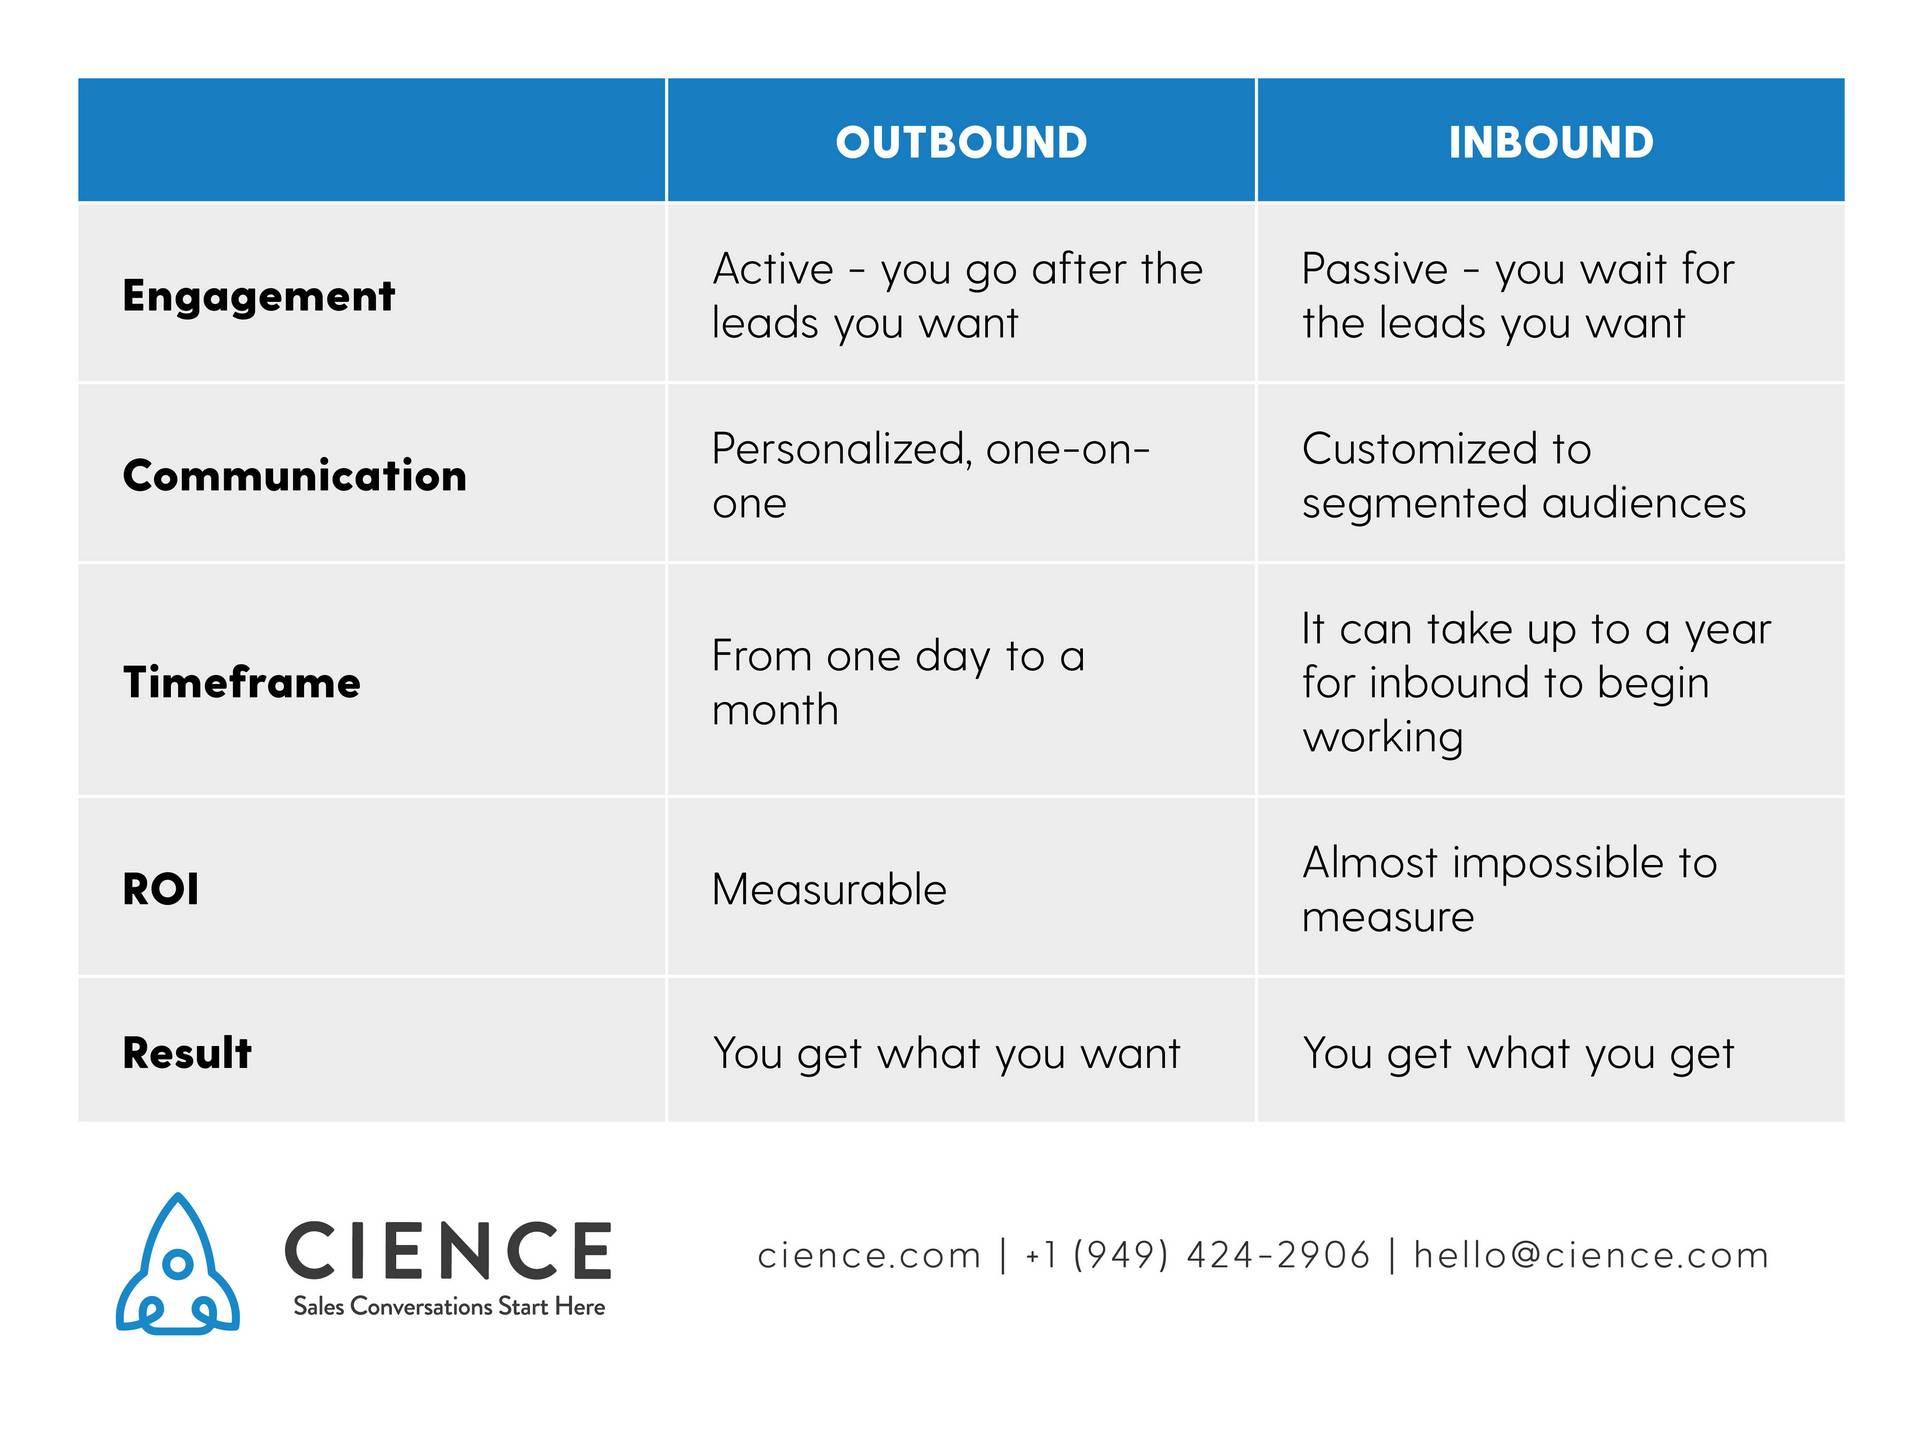 Outbound vs Inbound - comparison table: Engagement; Communication; Timeframe; ROI; Result